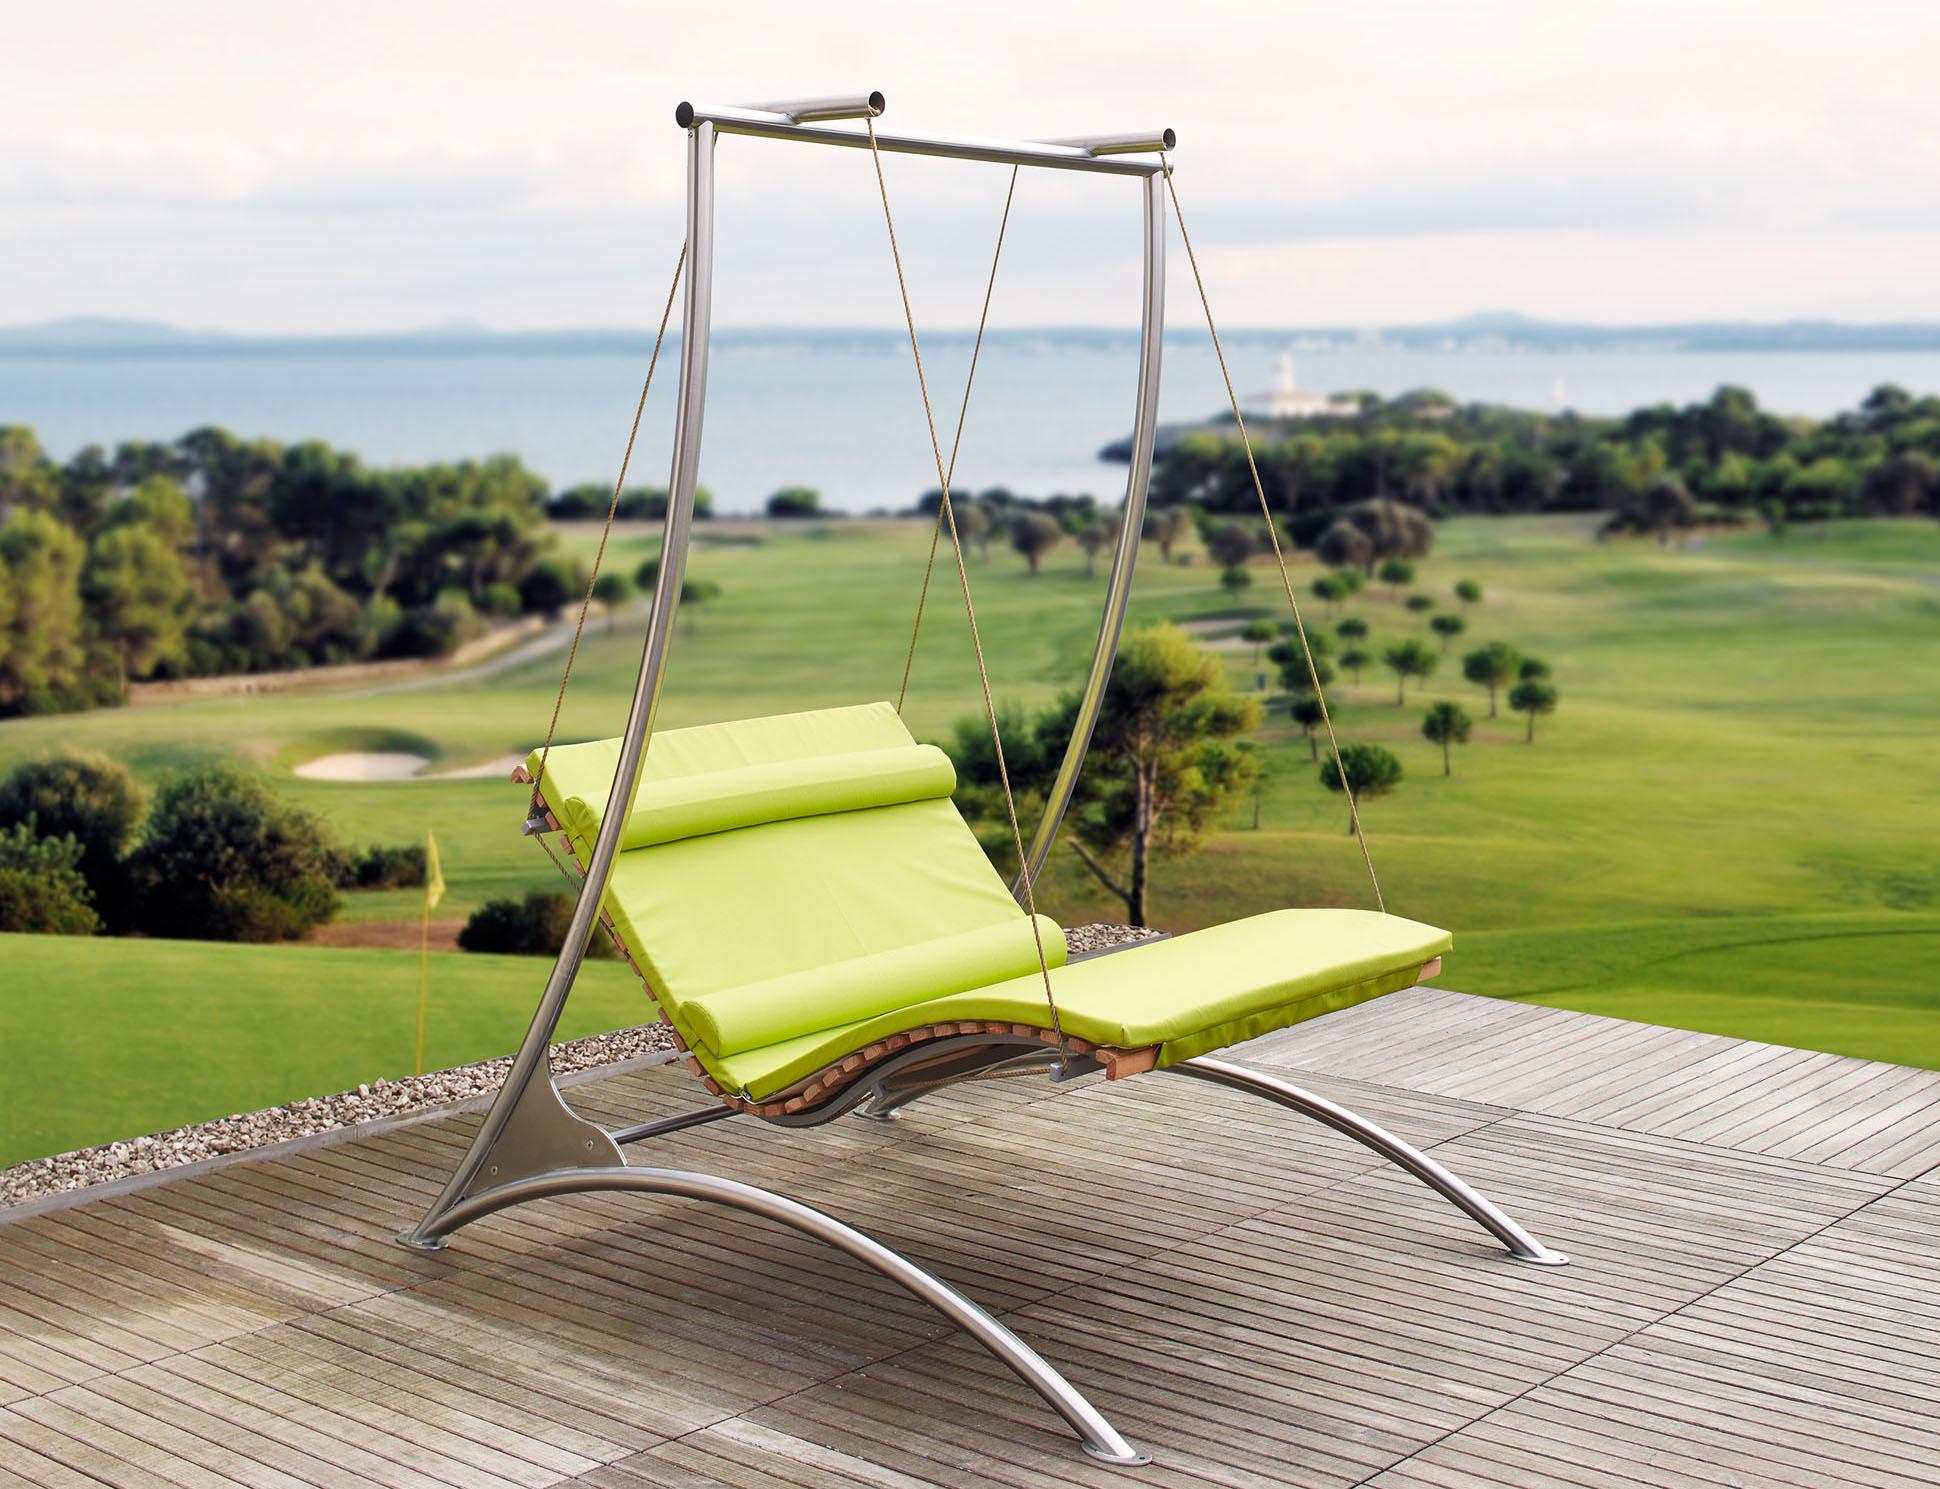 schwebeliege siesta sky wellnessliege sonnenliege. Black Bedroom Furniture Sets. Home Design Ideas